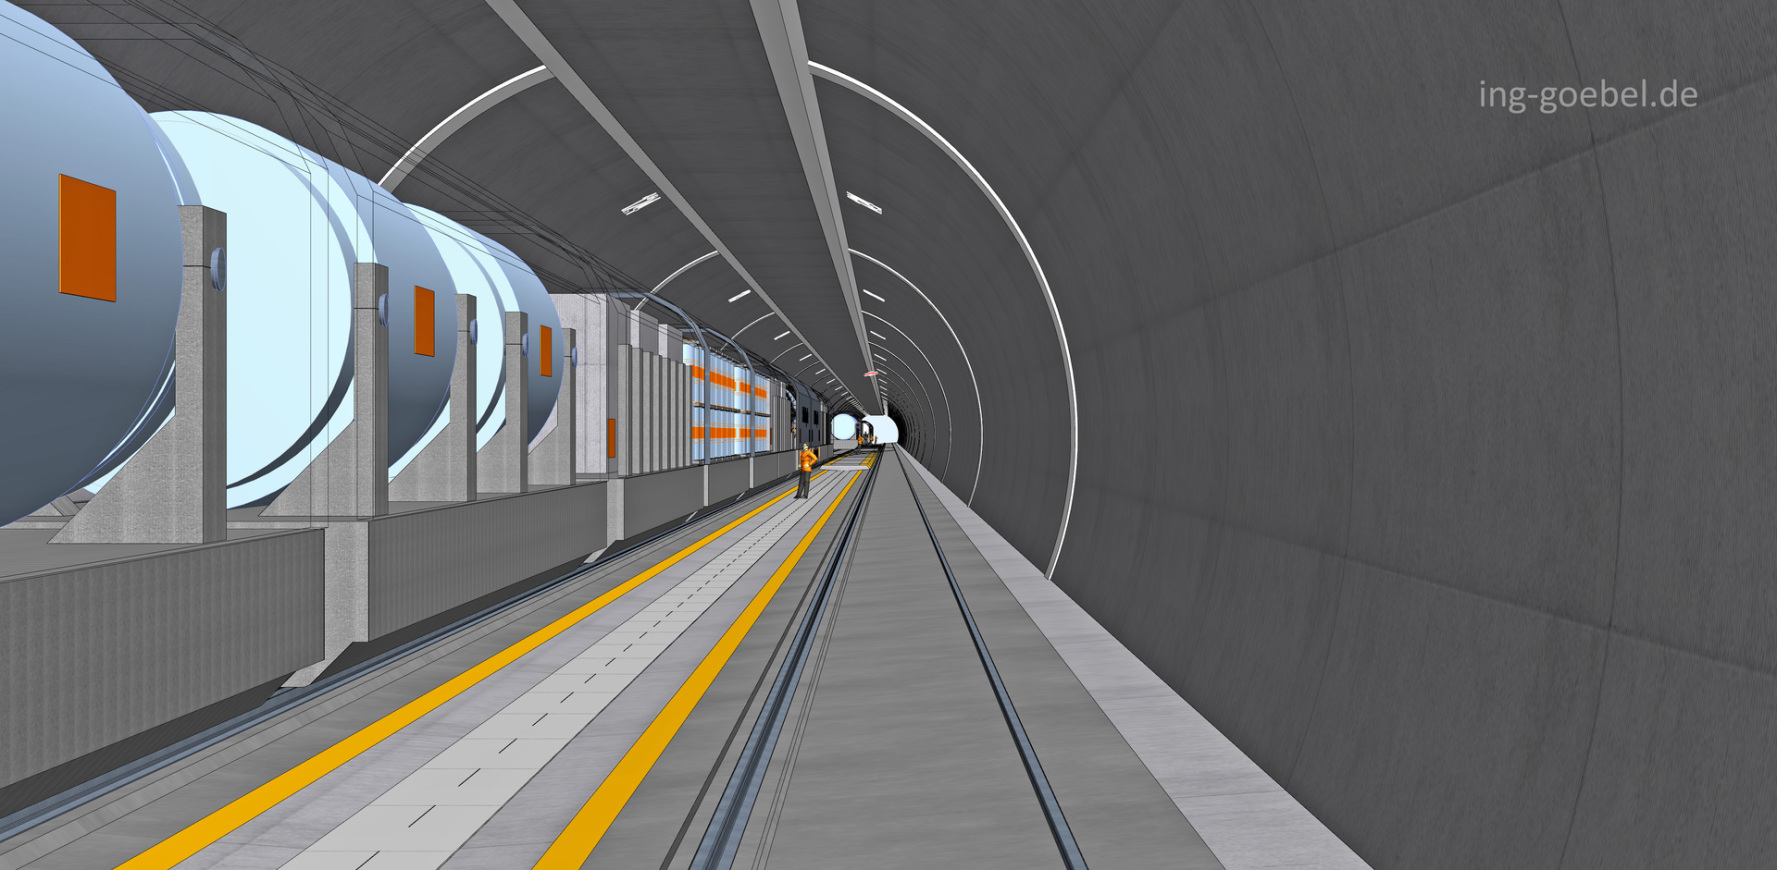 ART-TEL Endlager Tunnel Bundesgesellschaft für Endlagerung Peine BGE